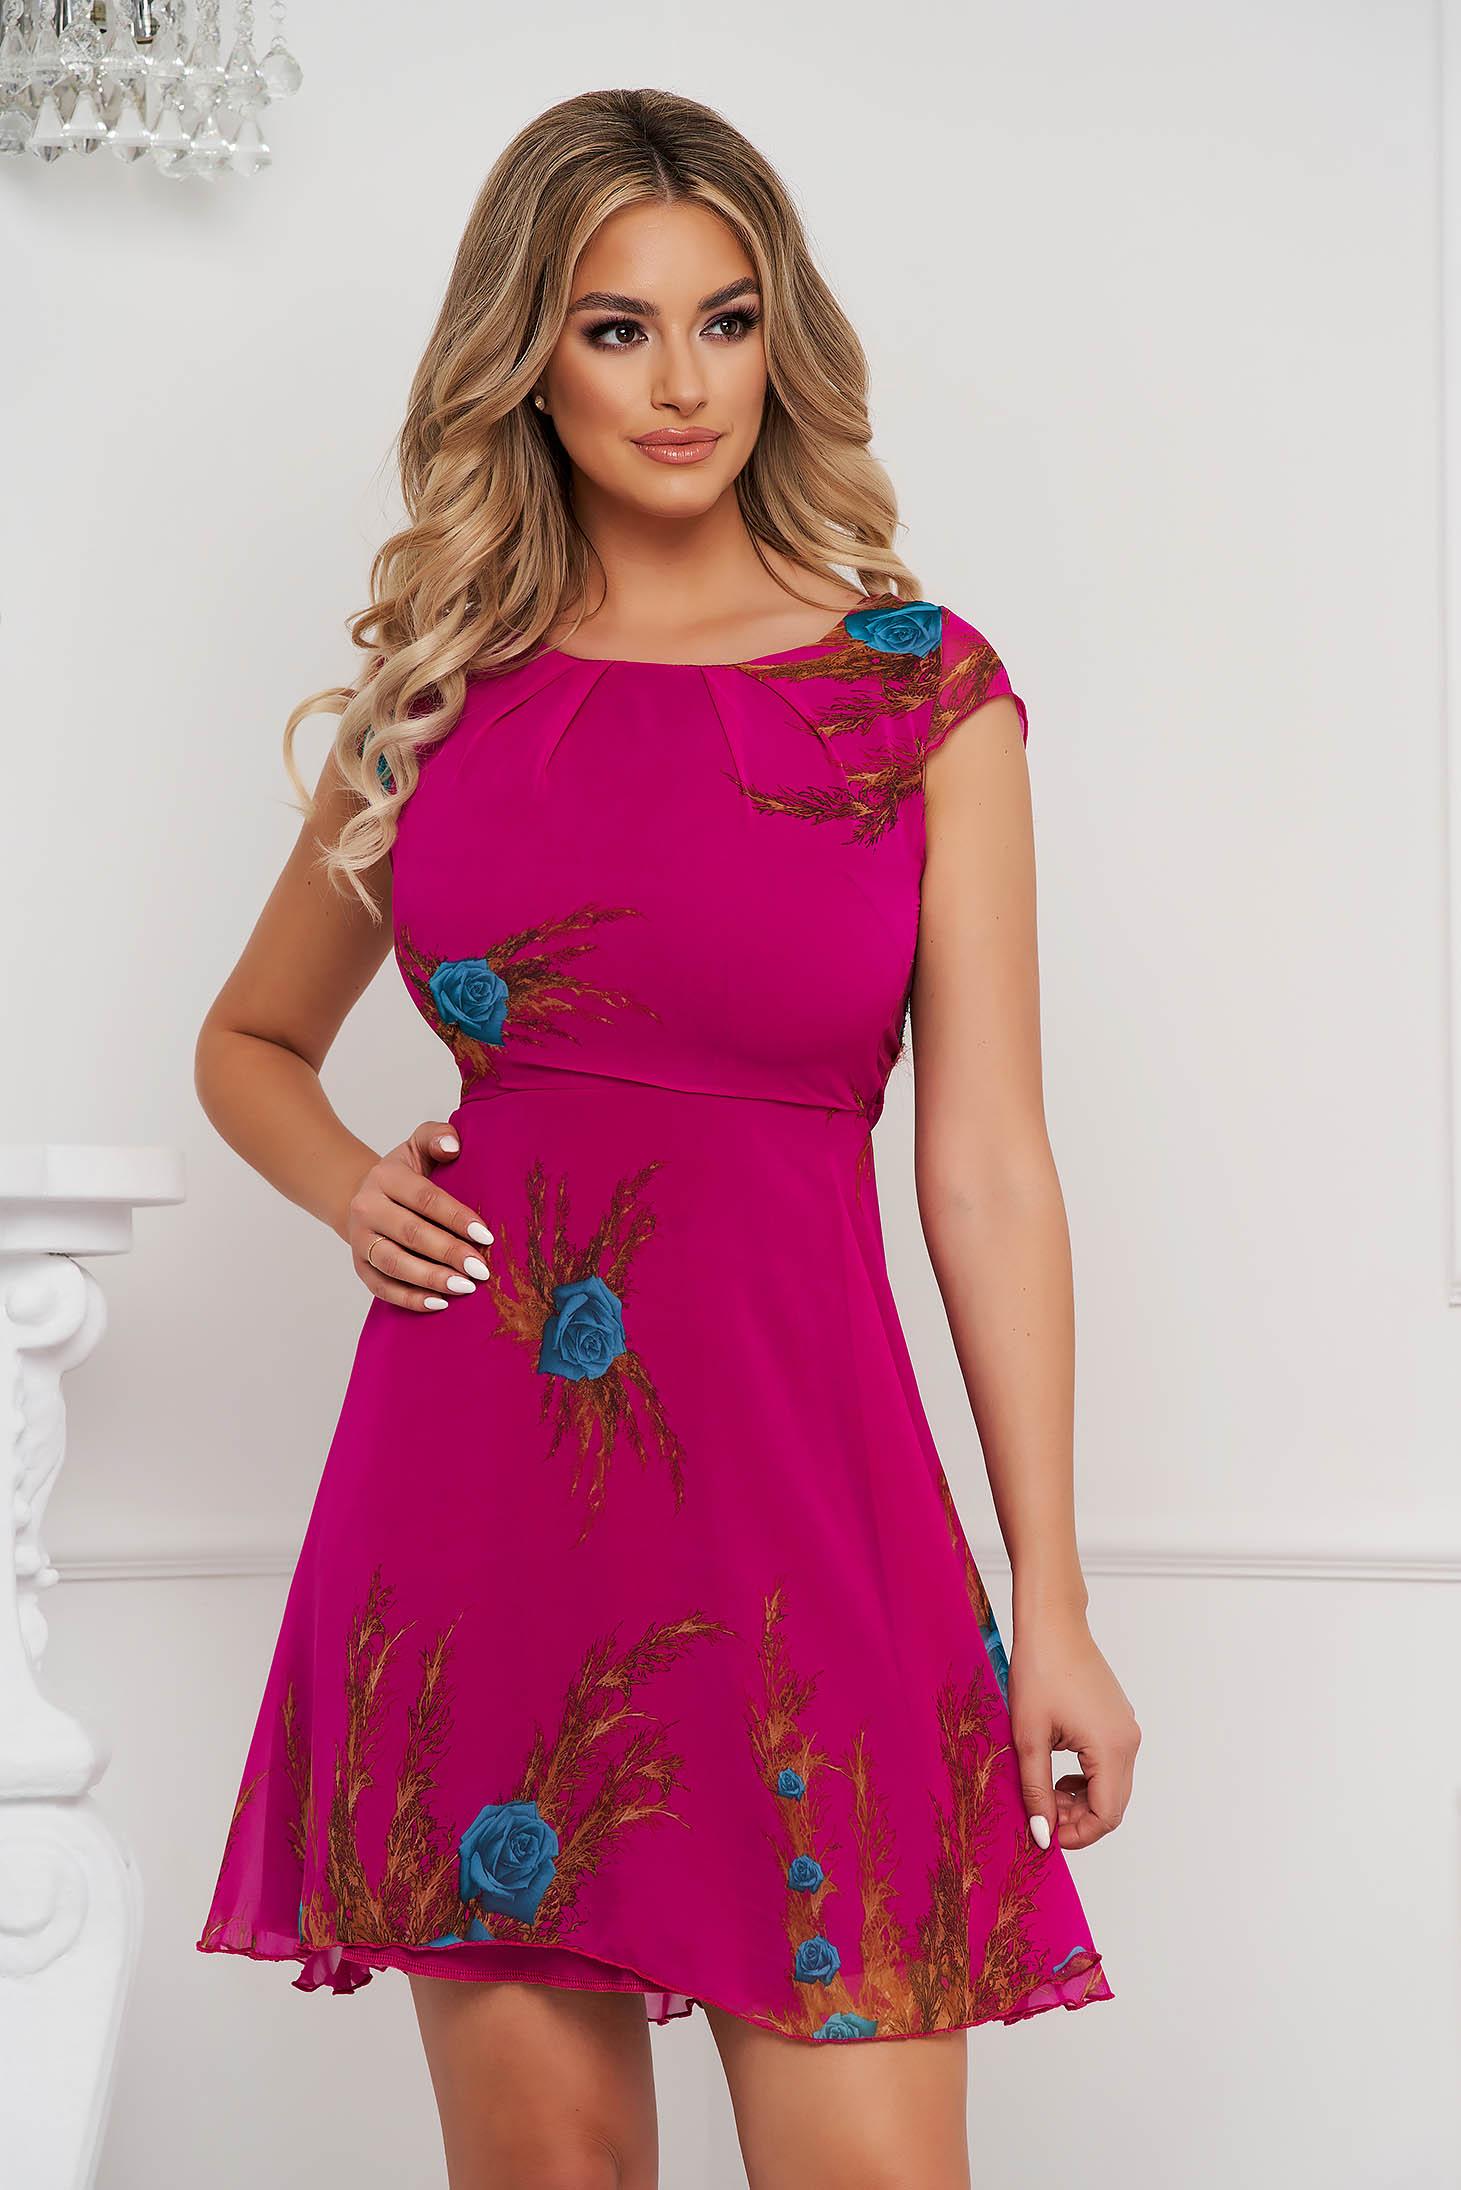 Fuchsia cloche dress with inside lining short cut from veil fabric short sleeves